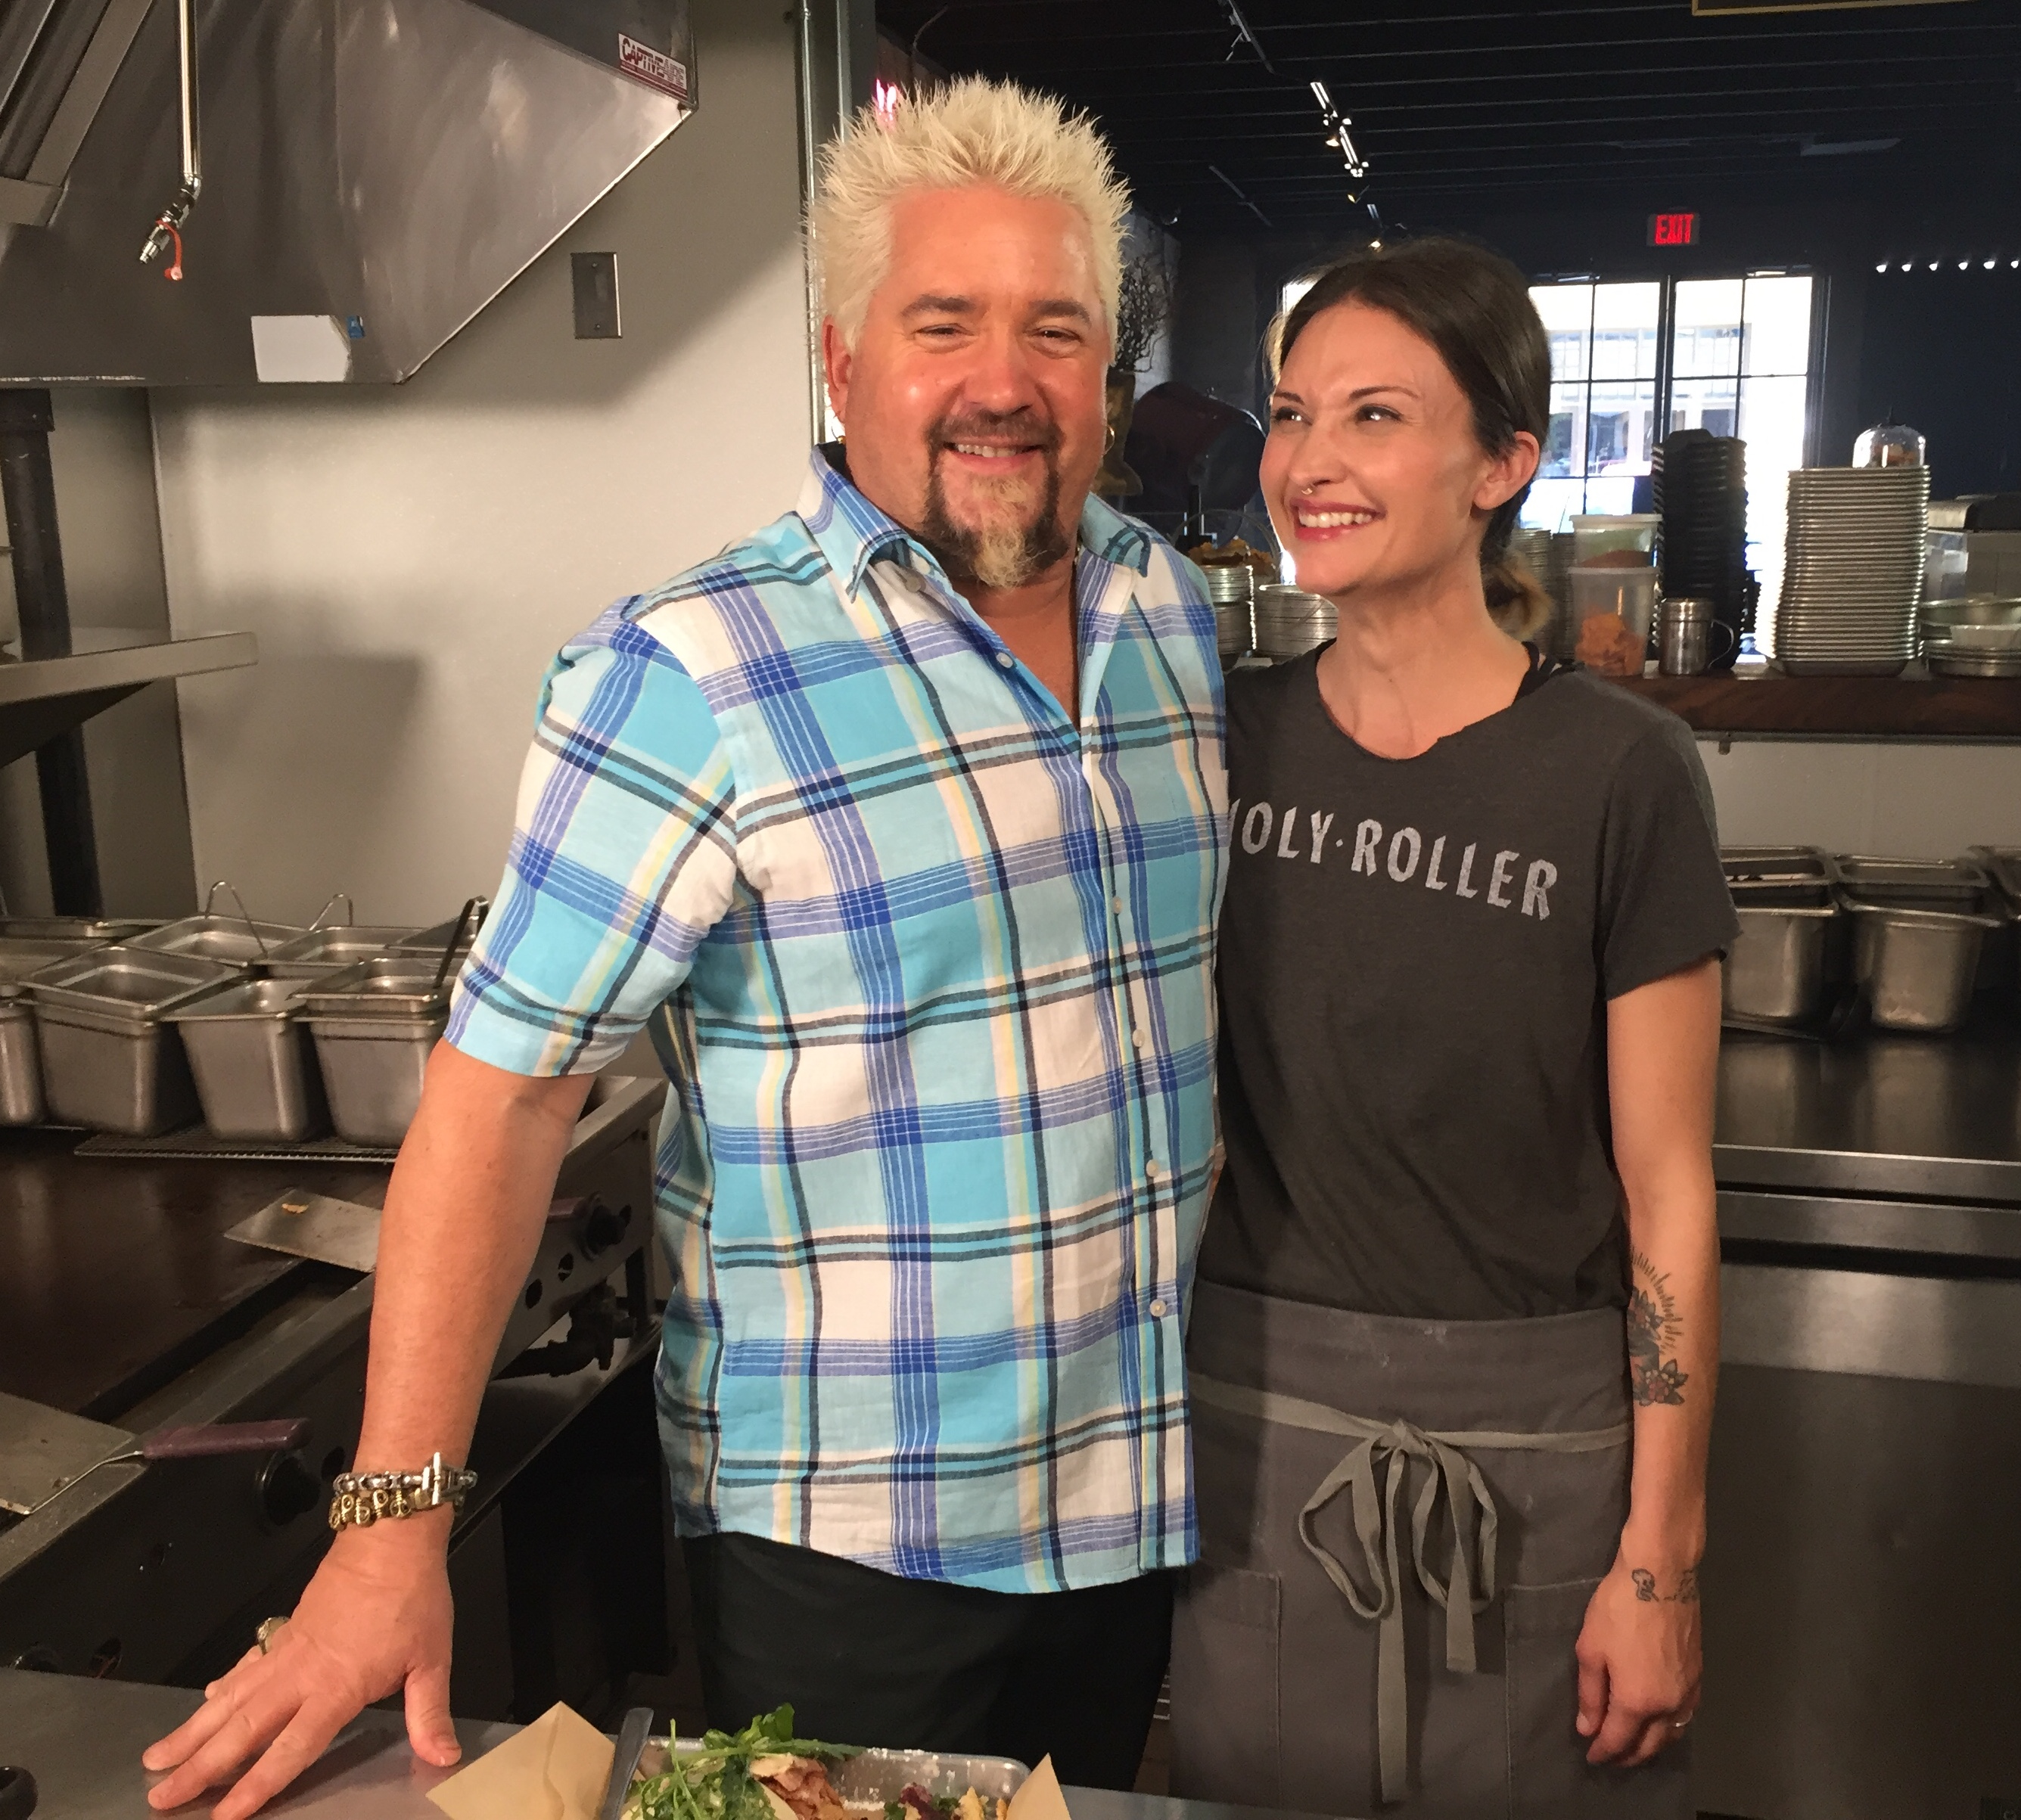 Guy Fieri and chef Callie Speer